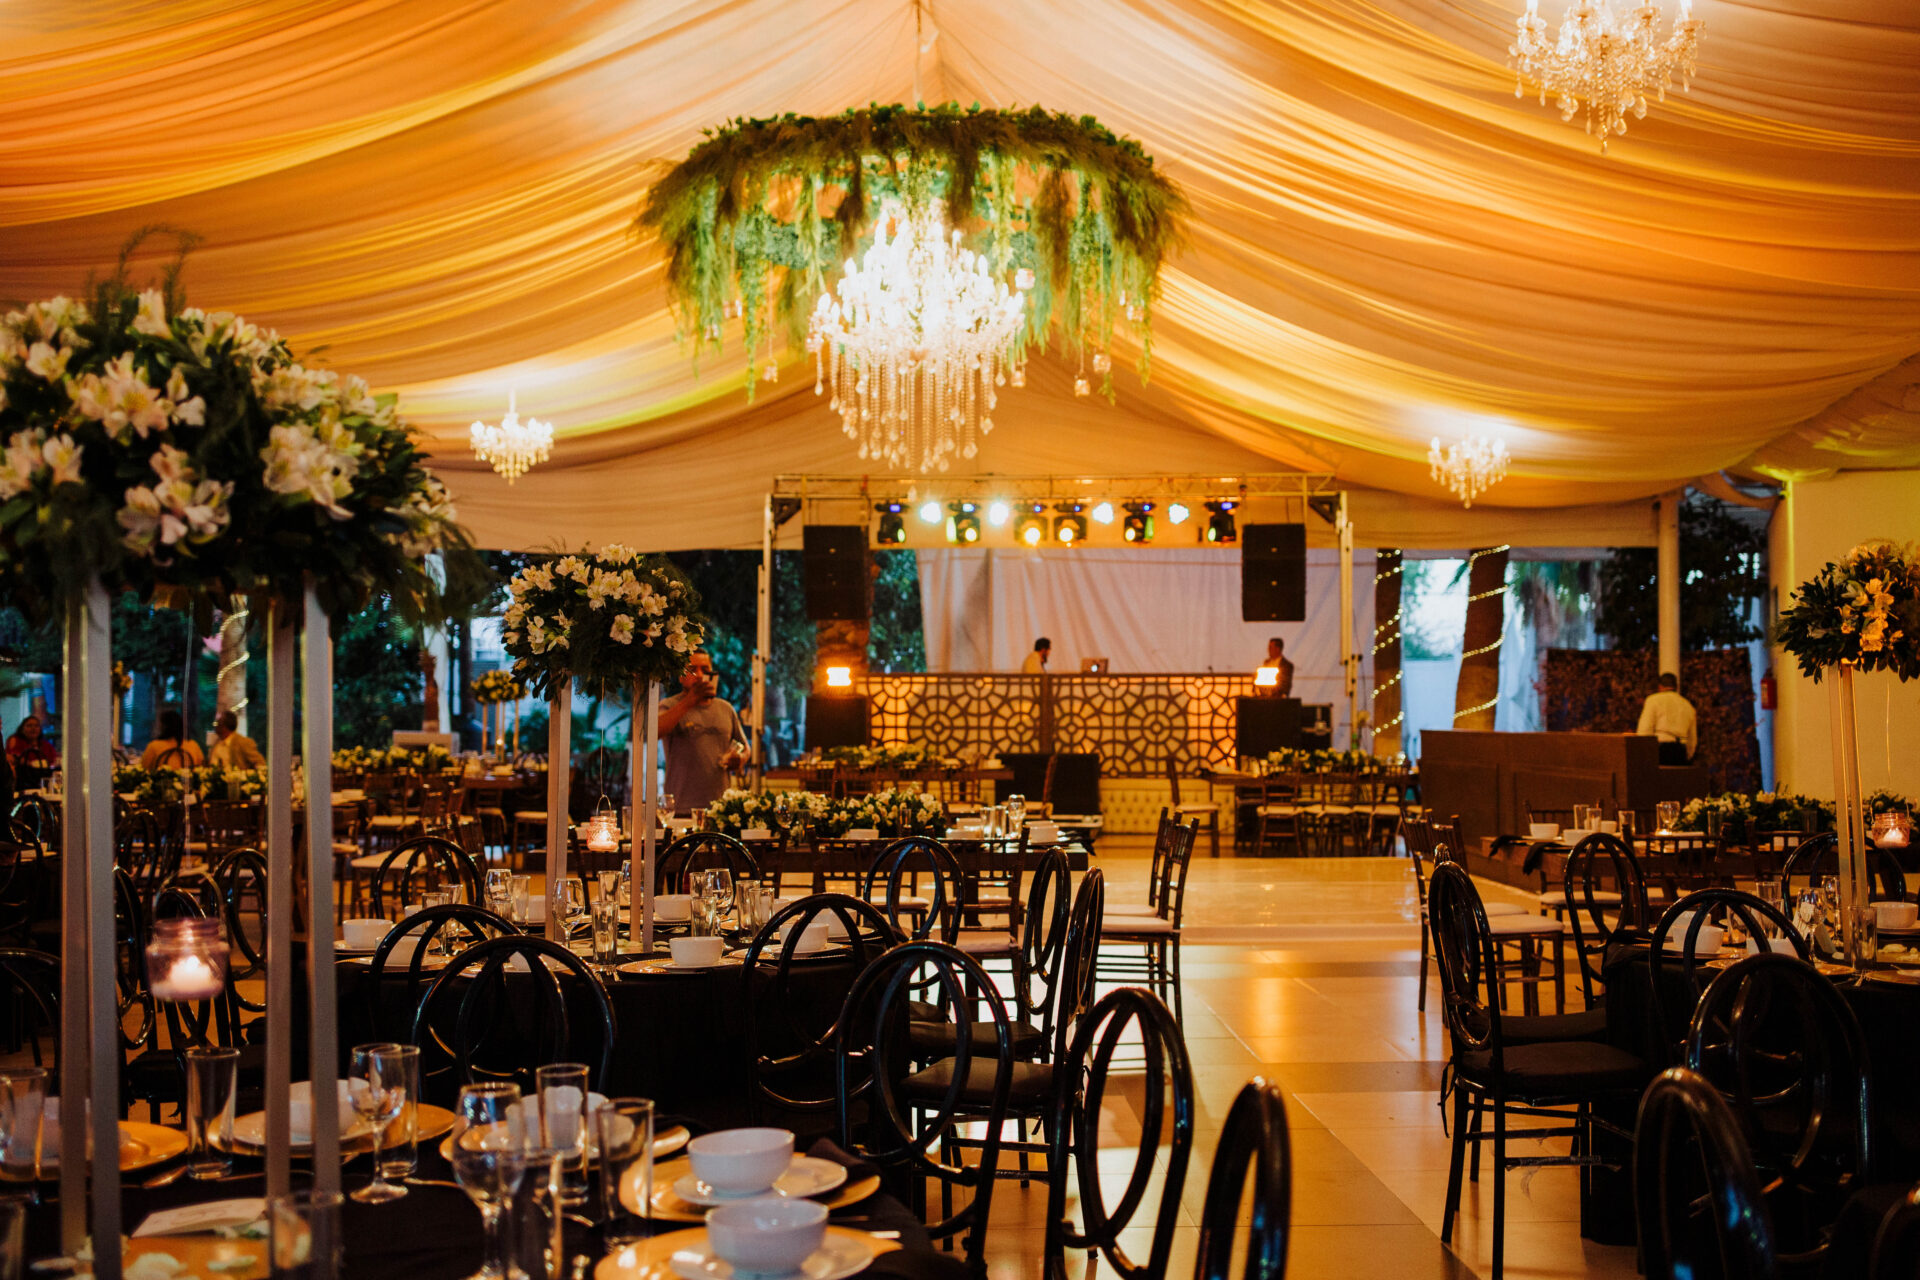 javier_noriega_fotografo_bodas_torreon_coahuila_zacatecas_wedding_photographer46a